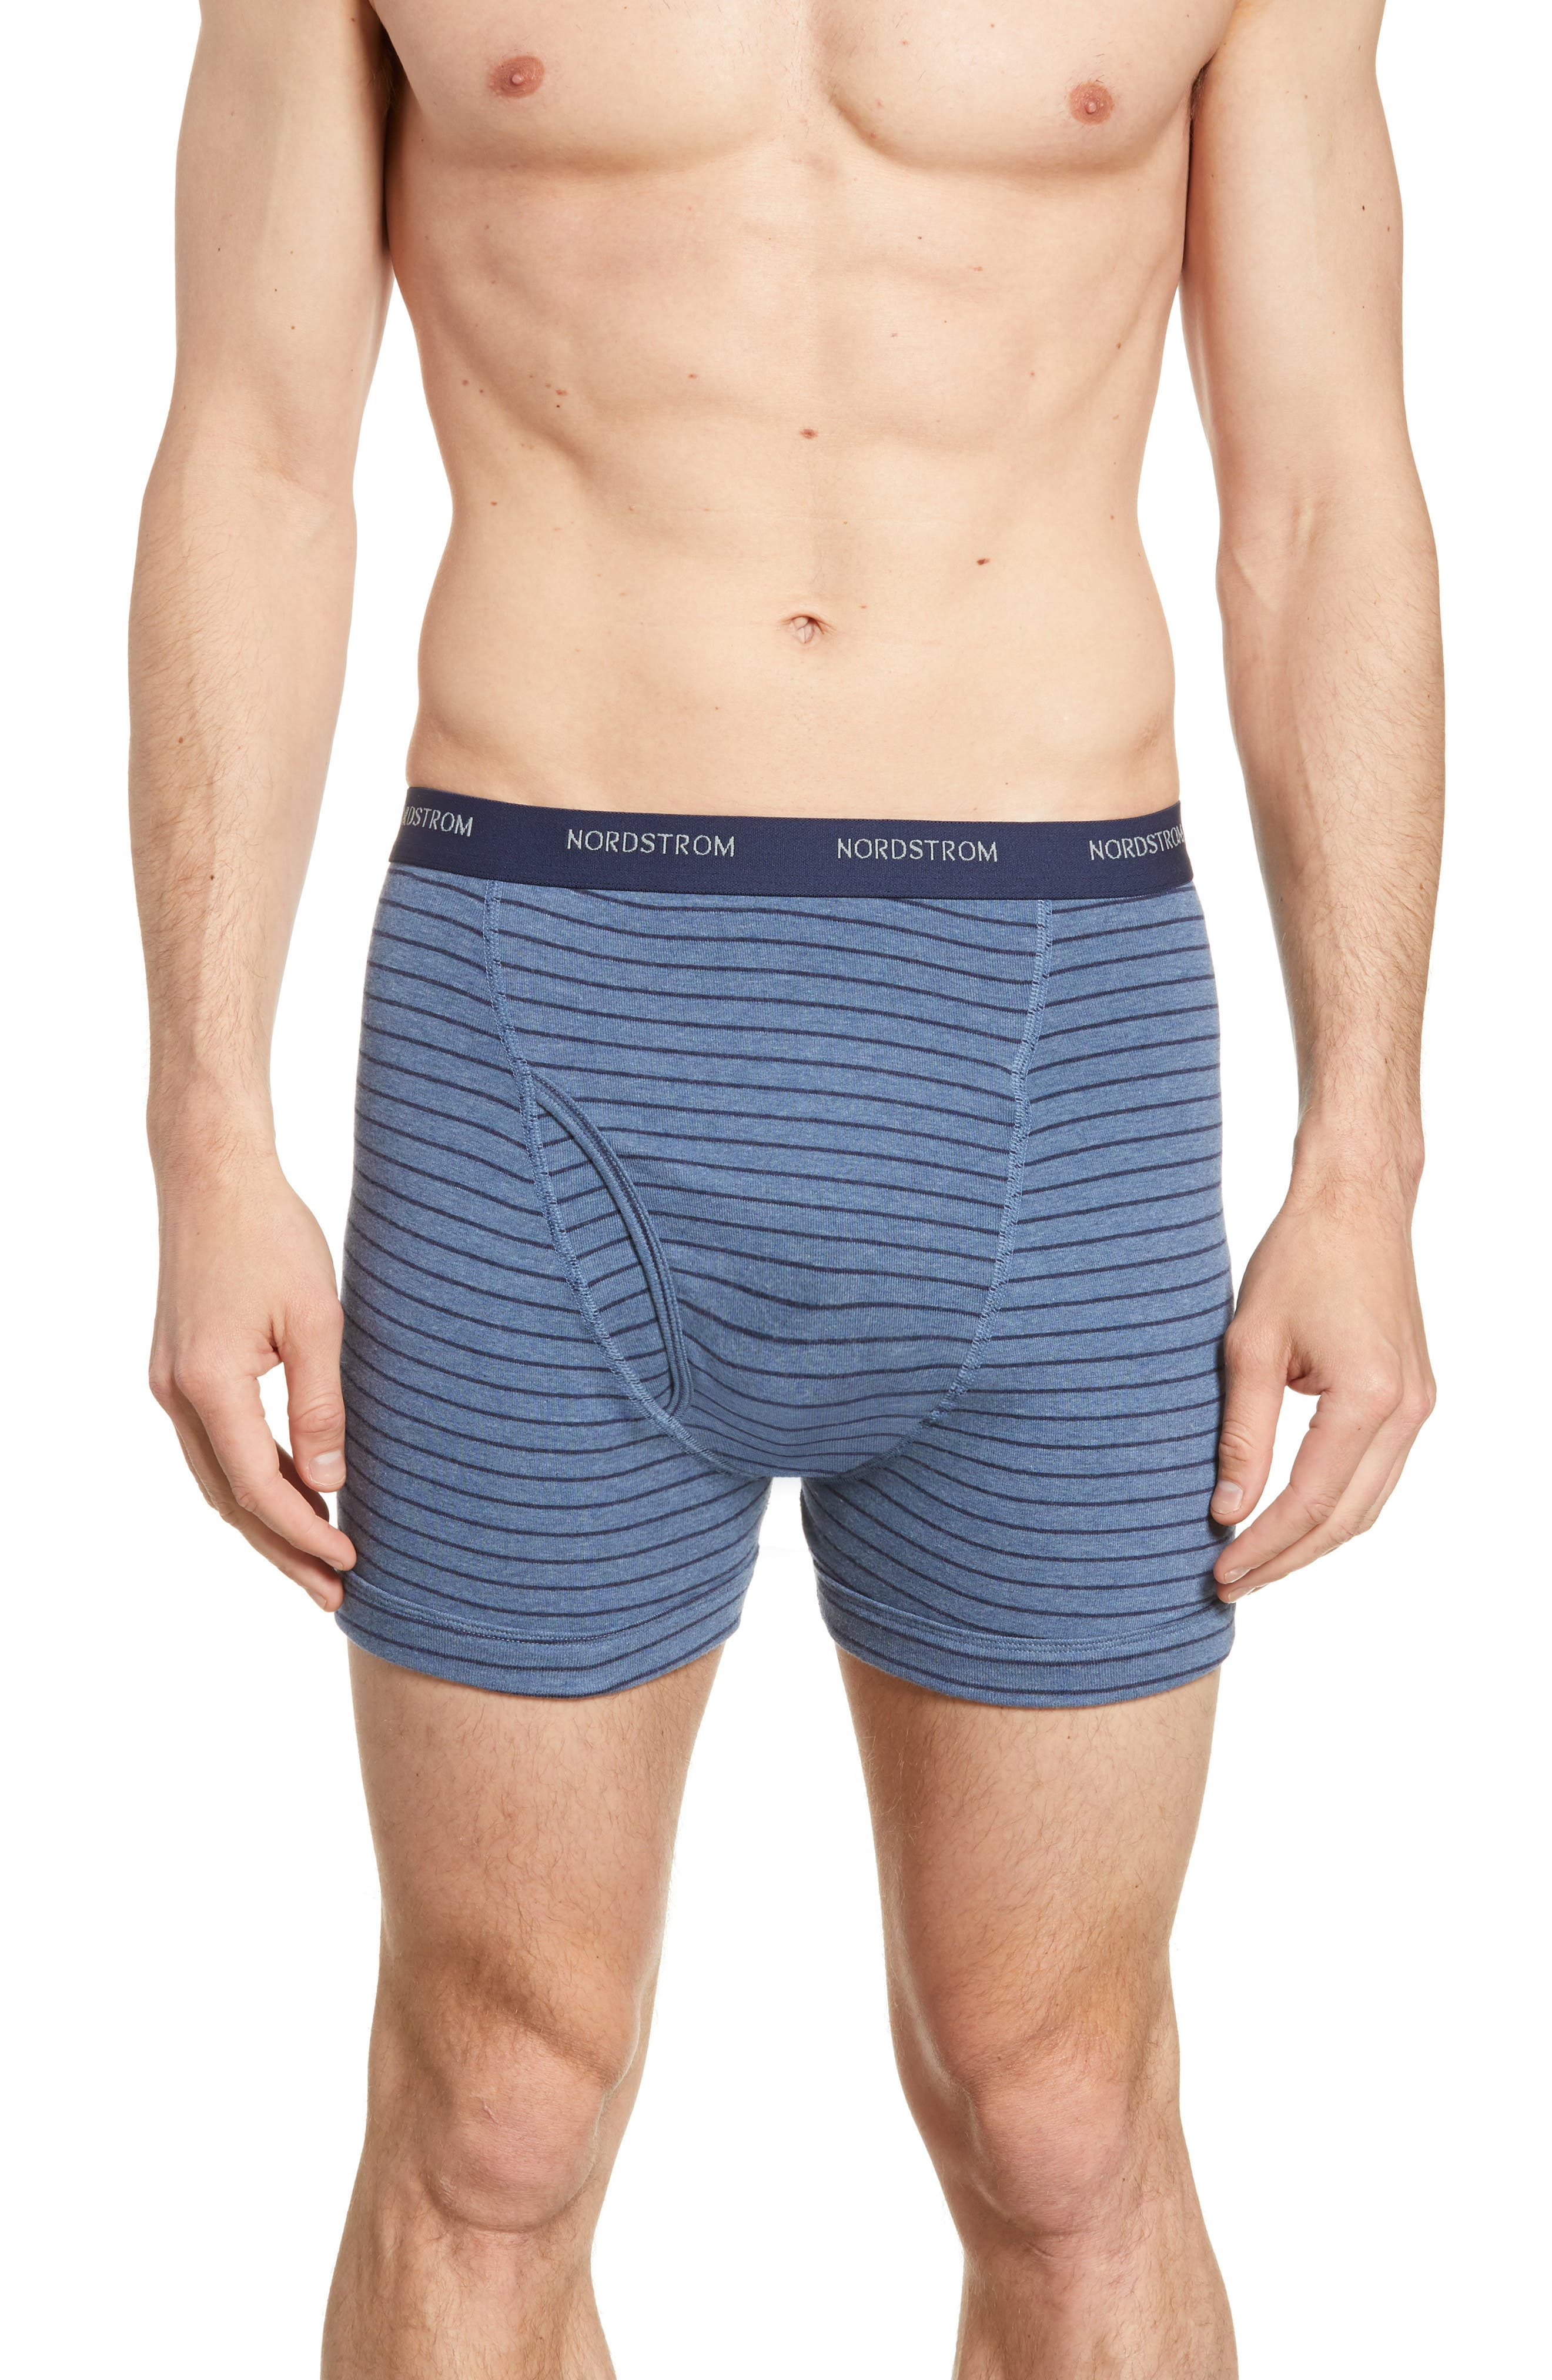 8334fb441fd Men's Underwear: Boxers, Briefs, Thongs & Trunks | Nordstrom